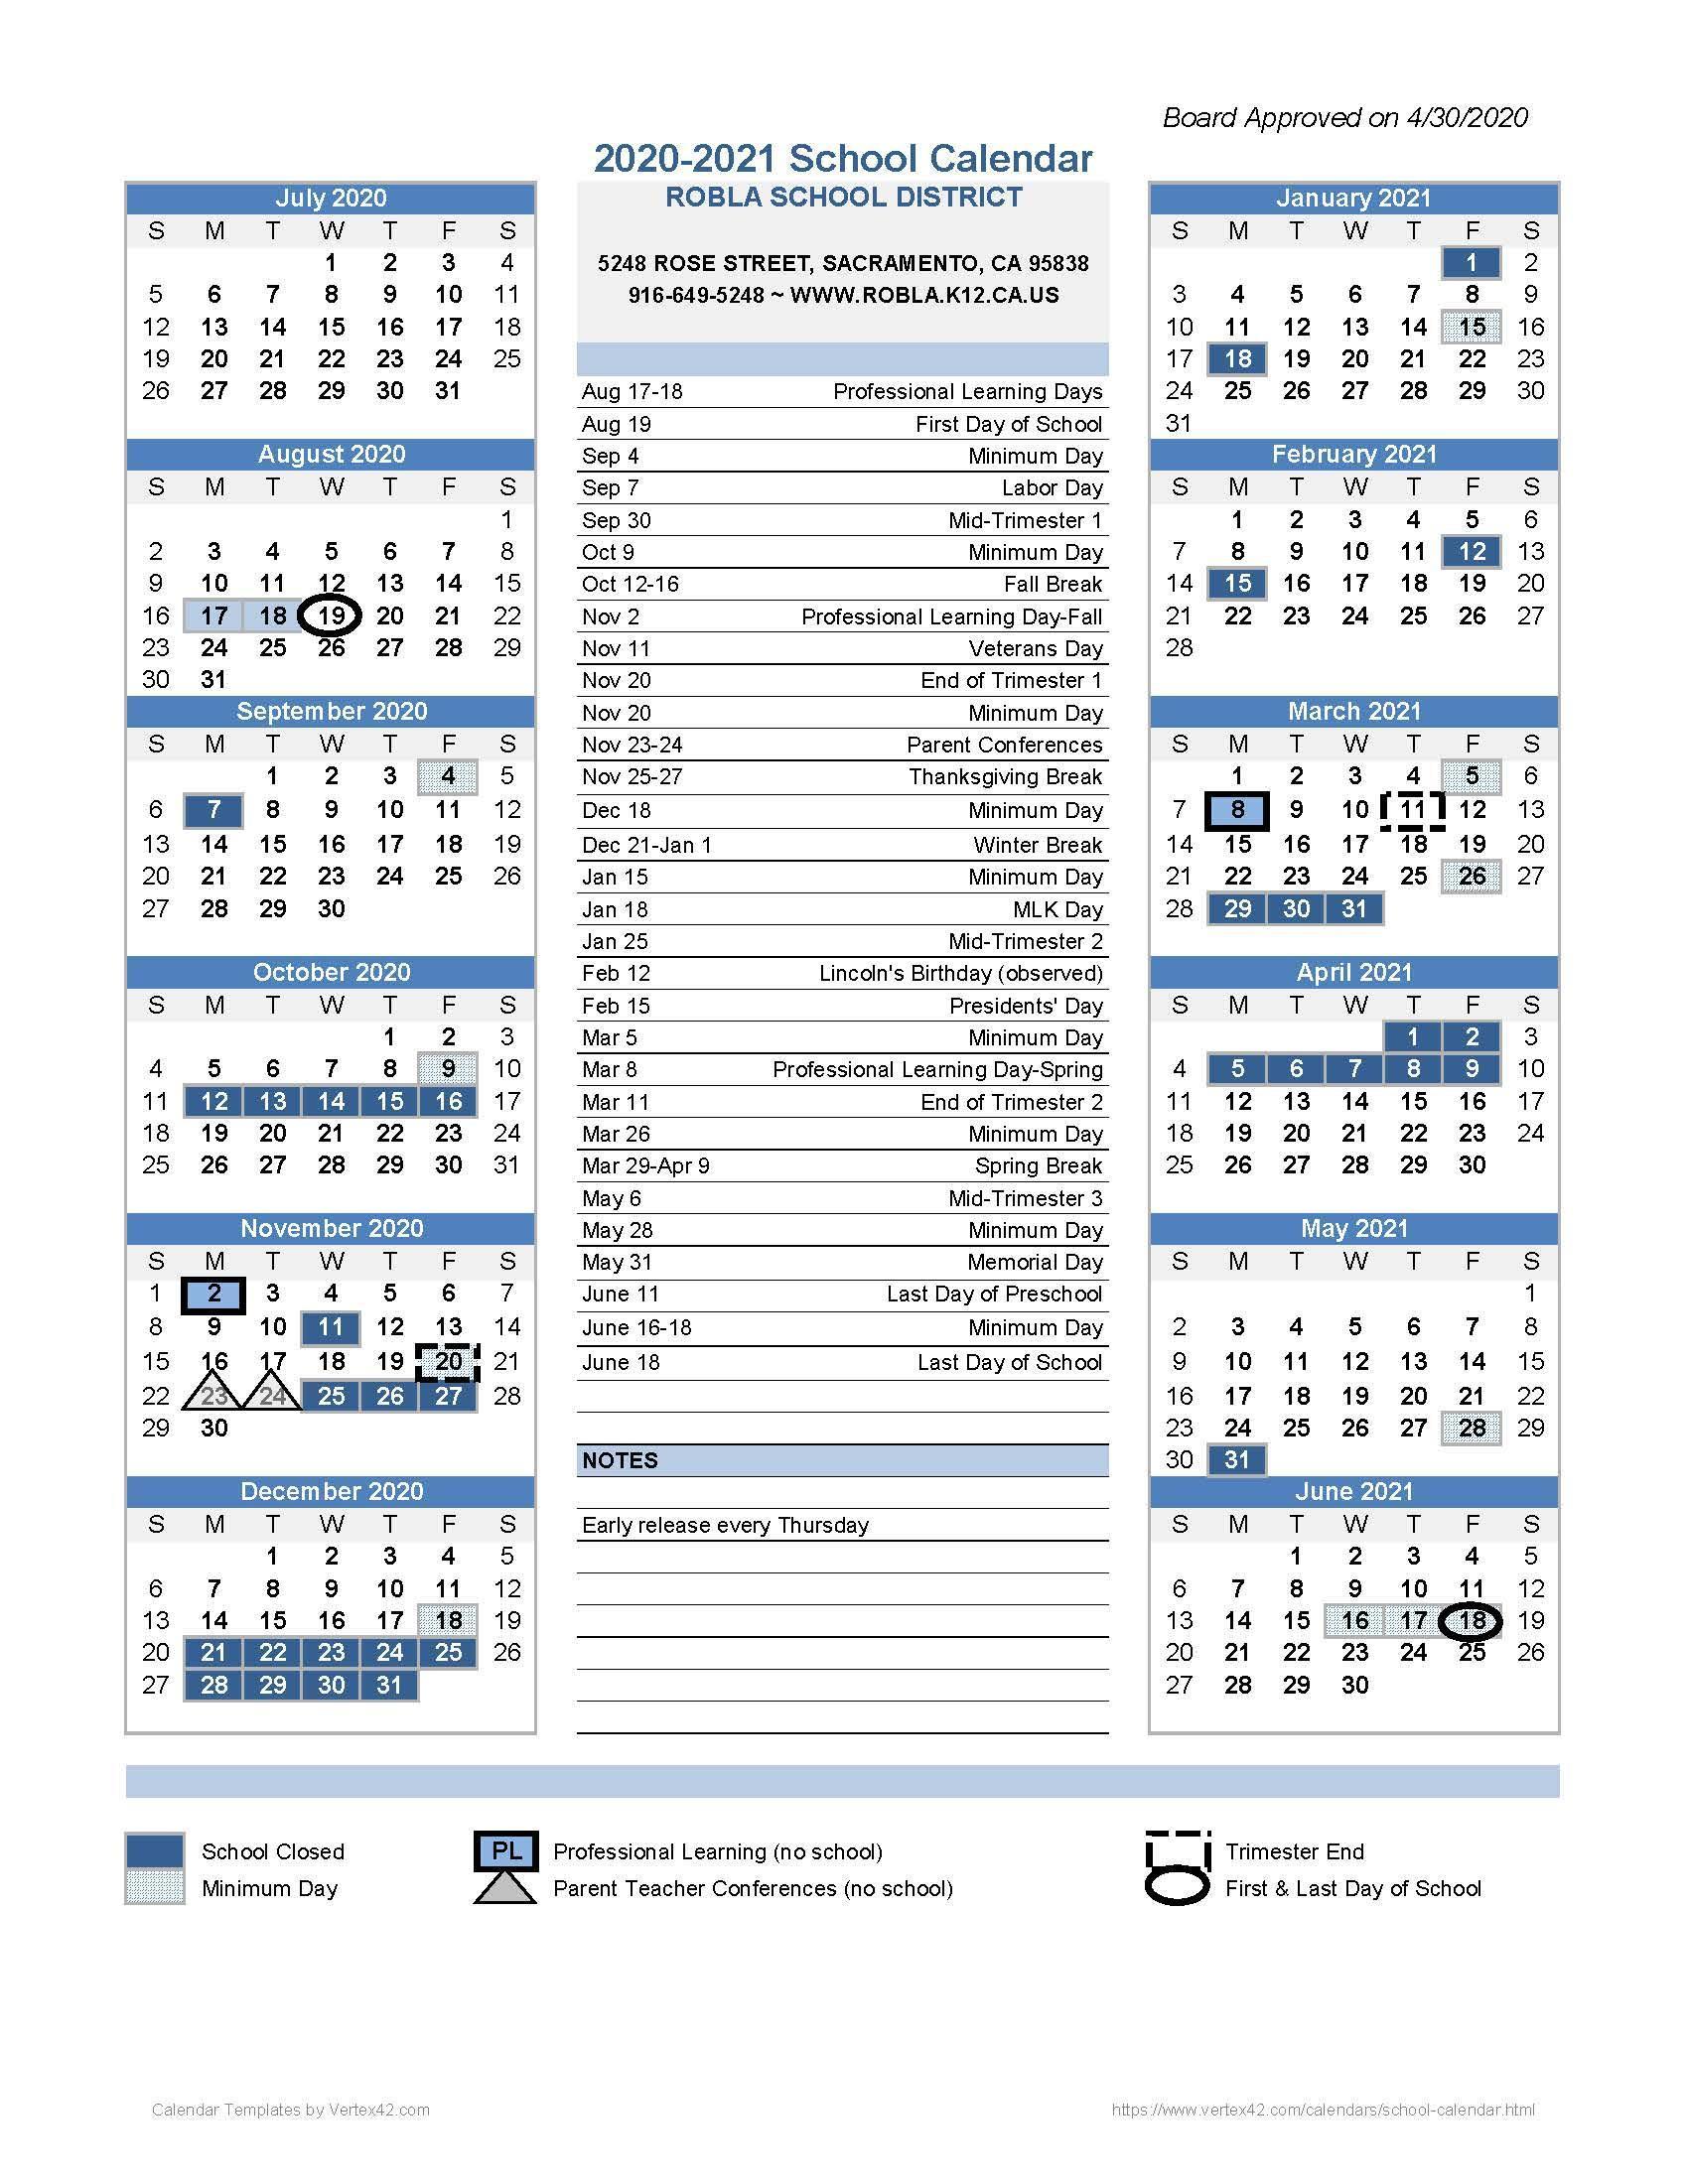 School Calendars – Student Enrollment – Robla School District For Corona Norco Usd School Calendar 2021